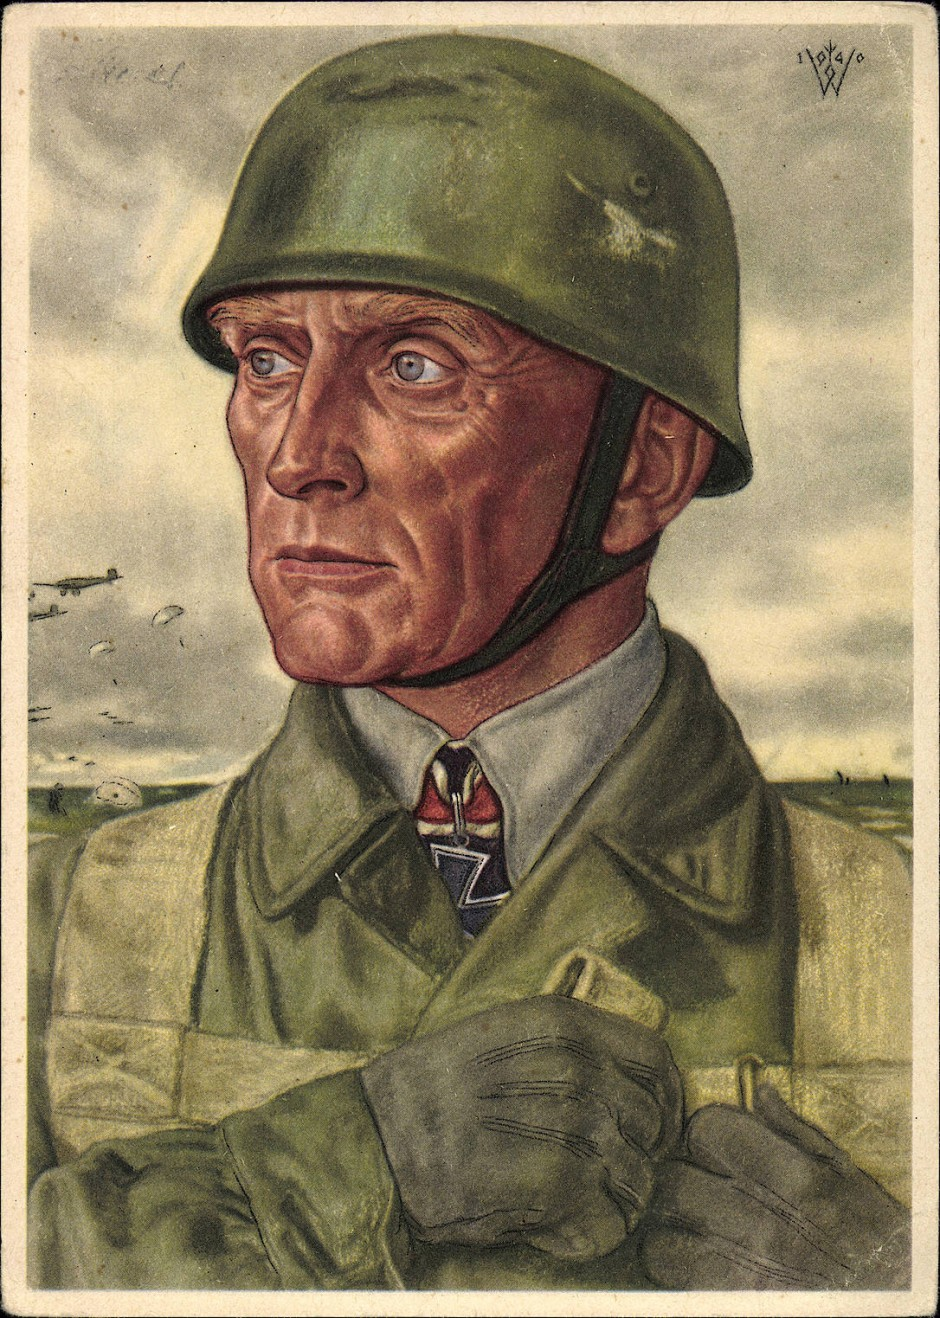 Deutsche Kriegsverbrecher